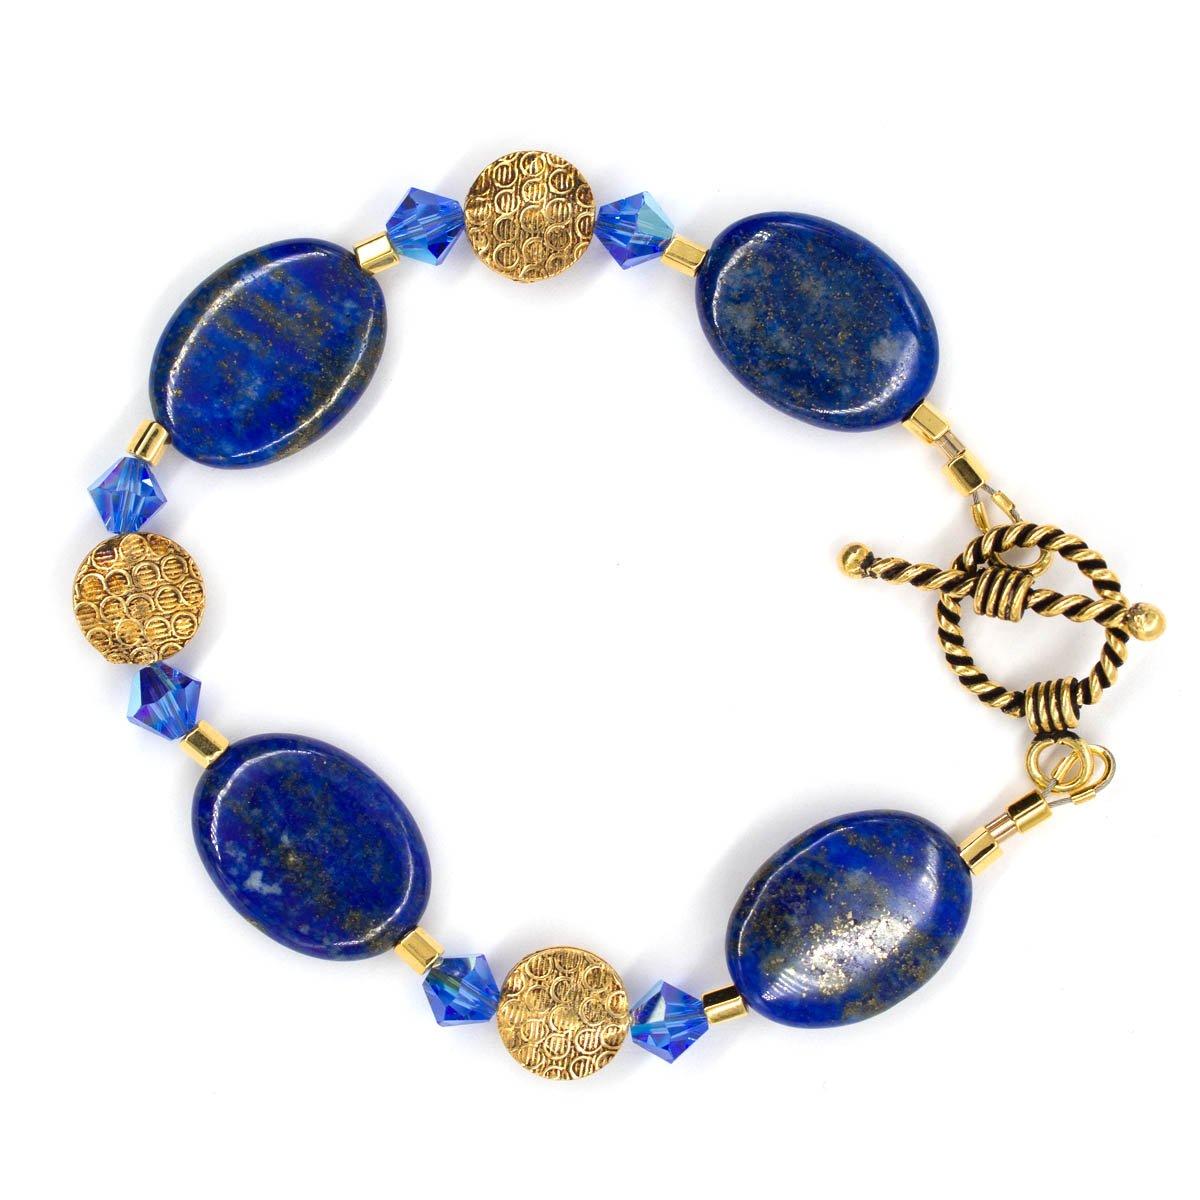 B504 - Sapphire Dreams Bracelet